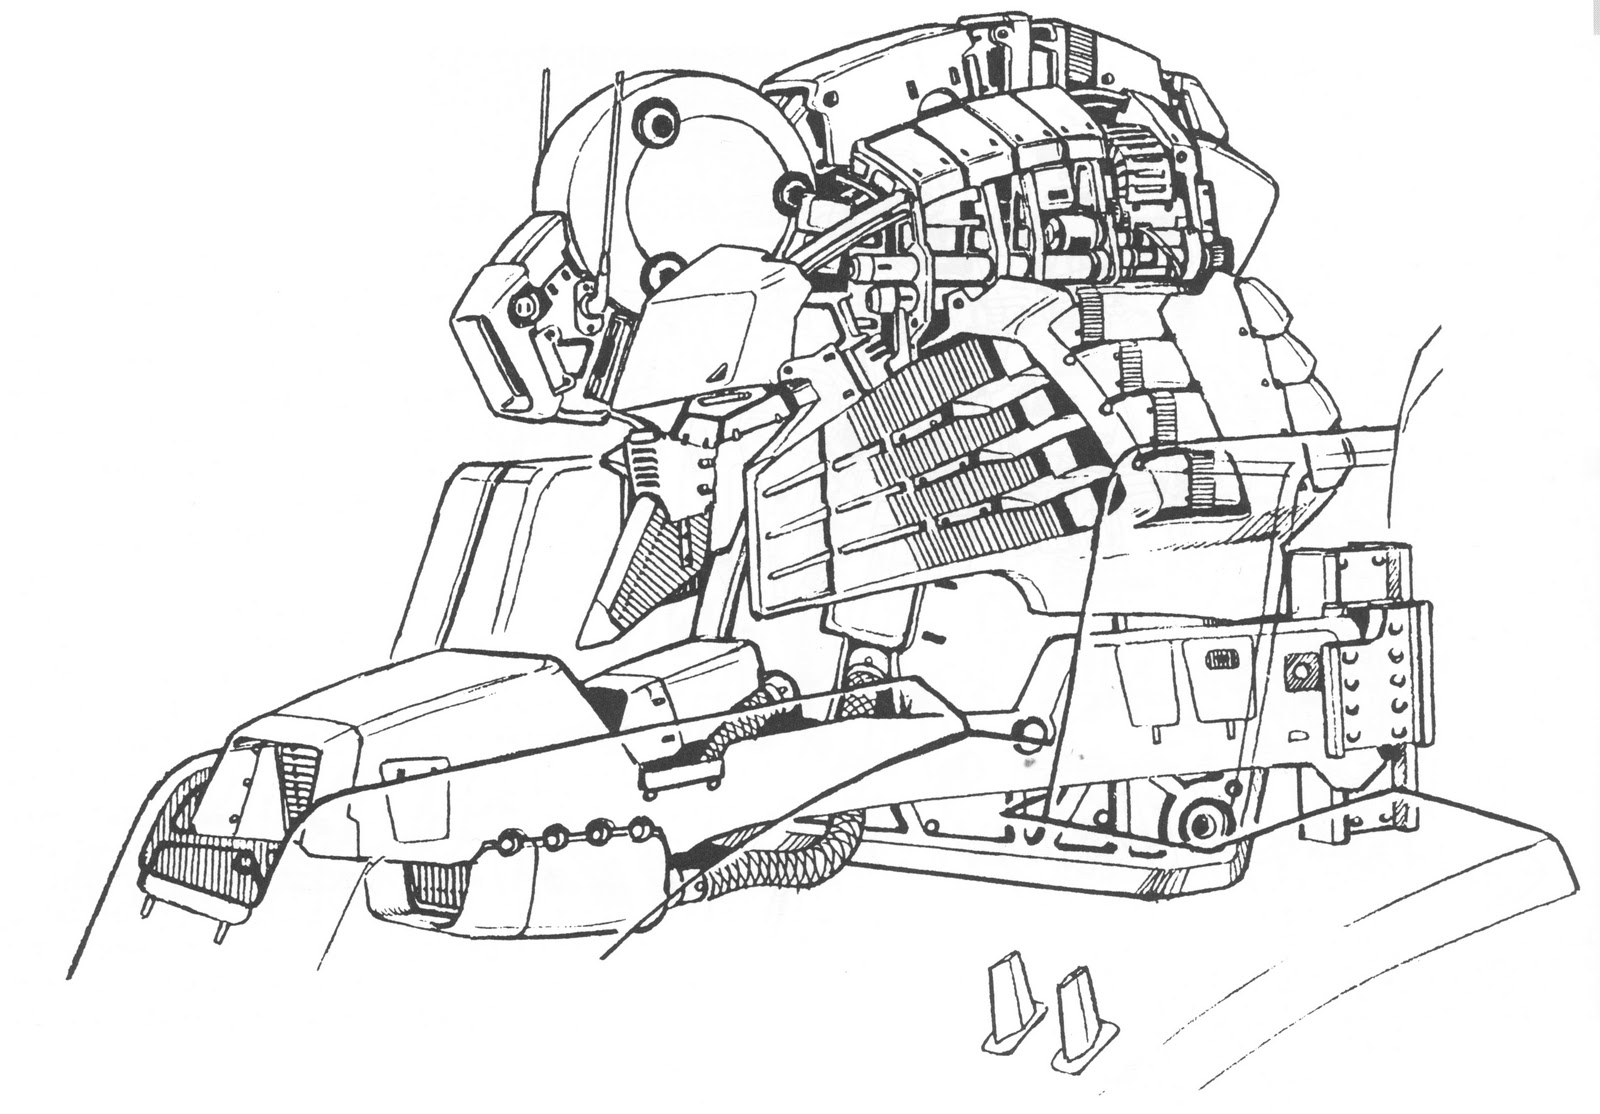 Head Strike Concept And Design